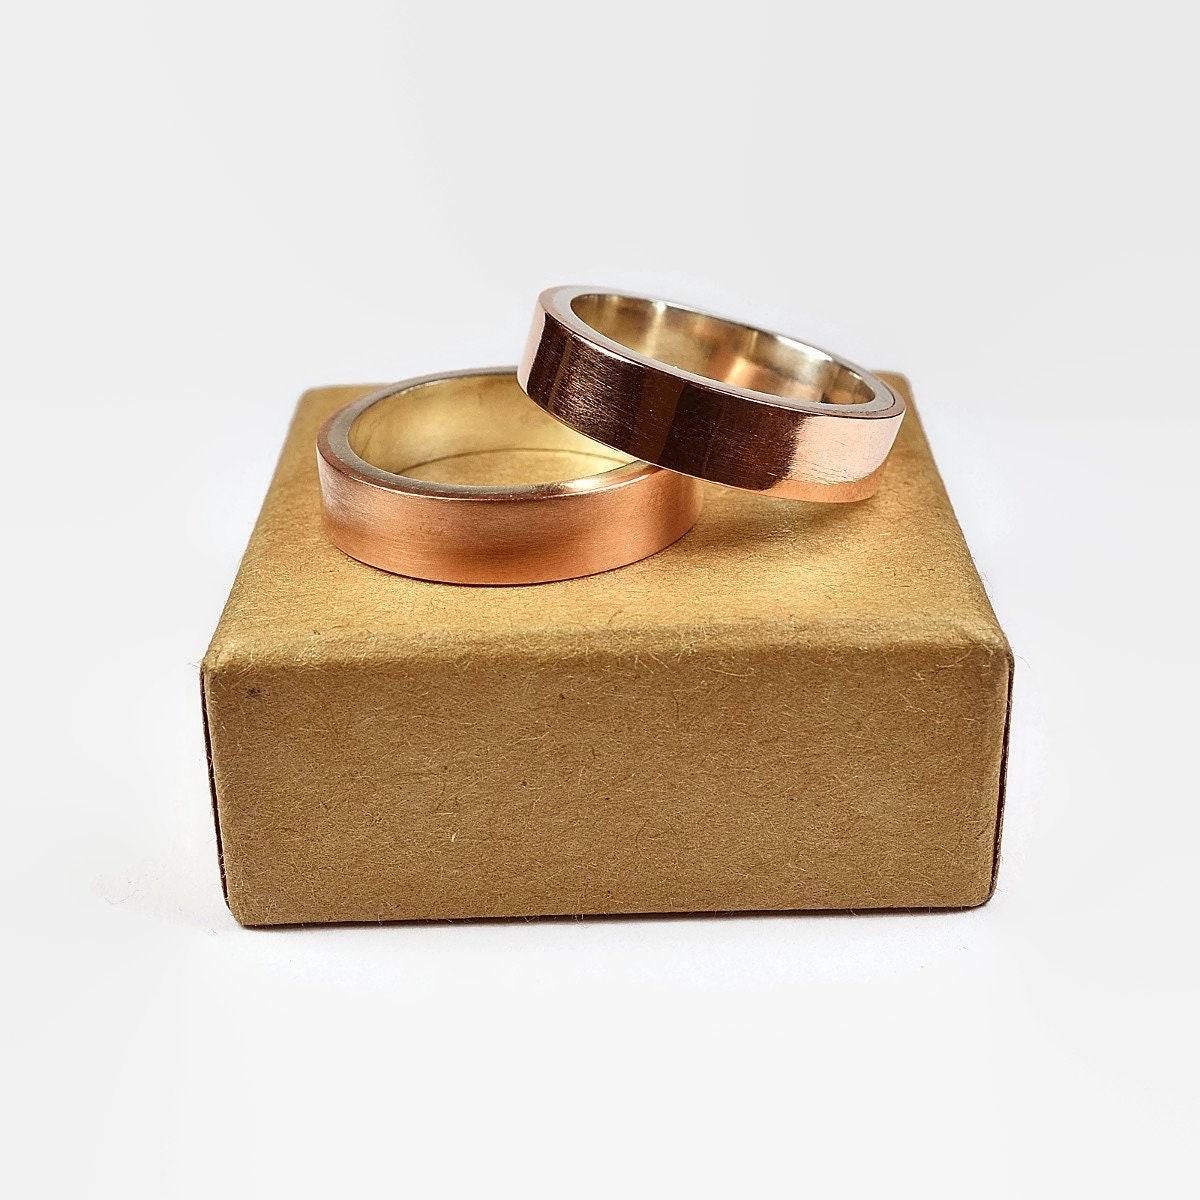 Mens Copper Wedding Band Ring Set Modern Style Flat Shape 6mm